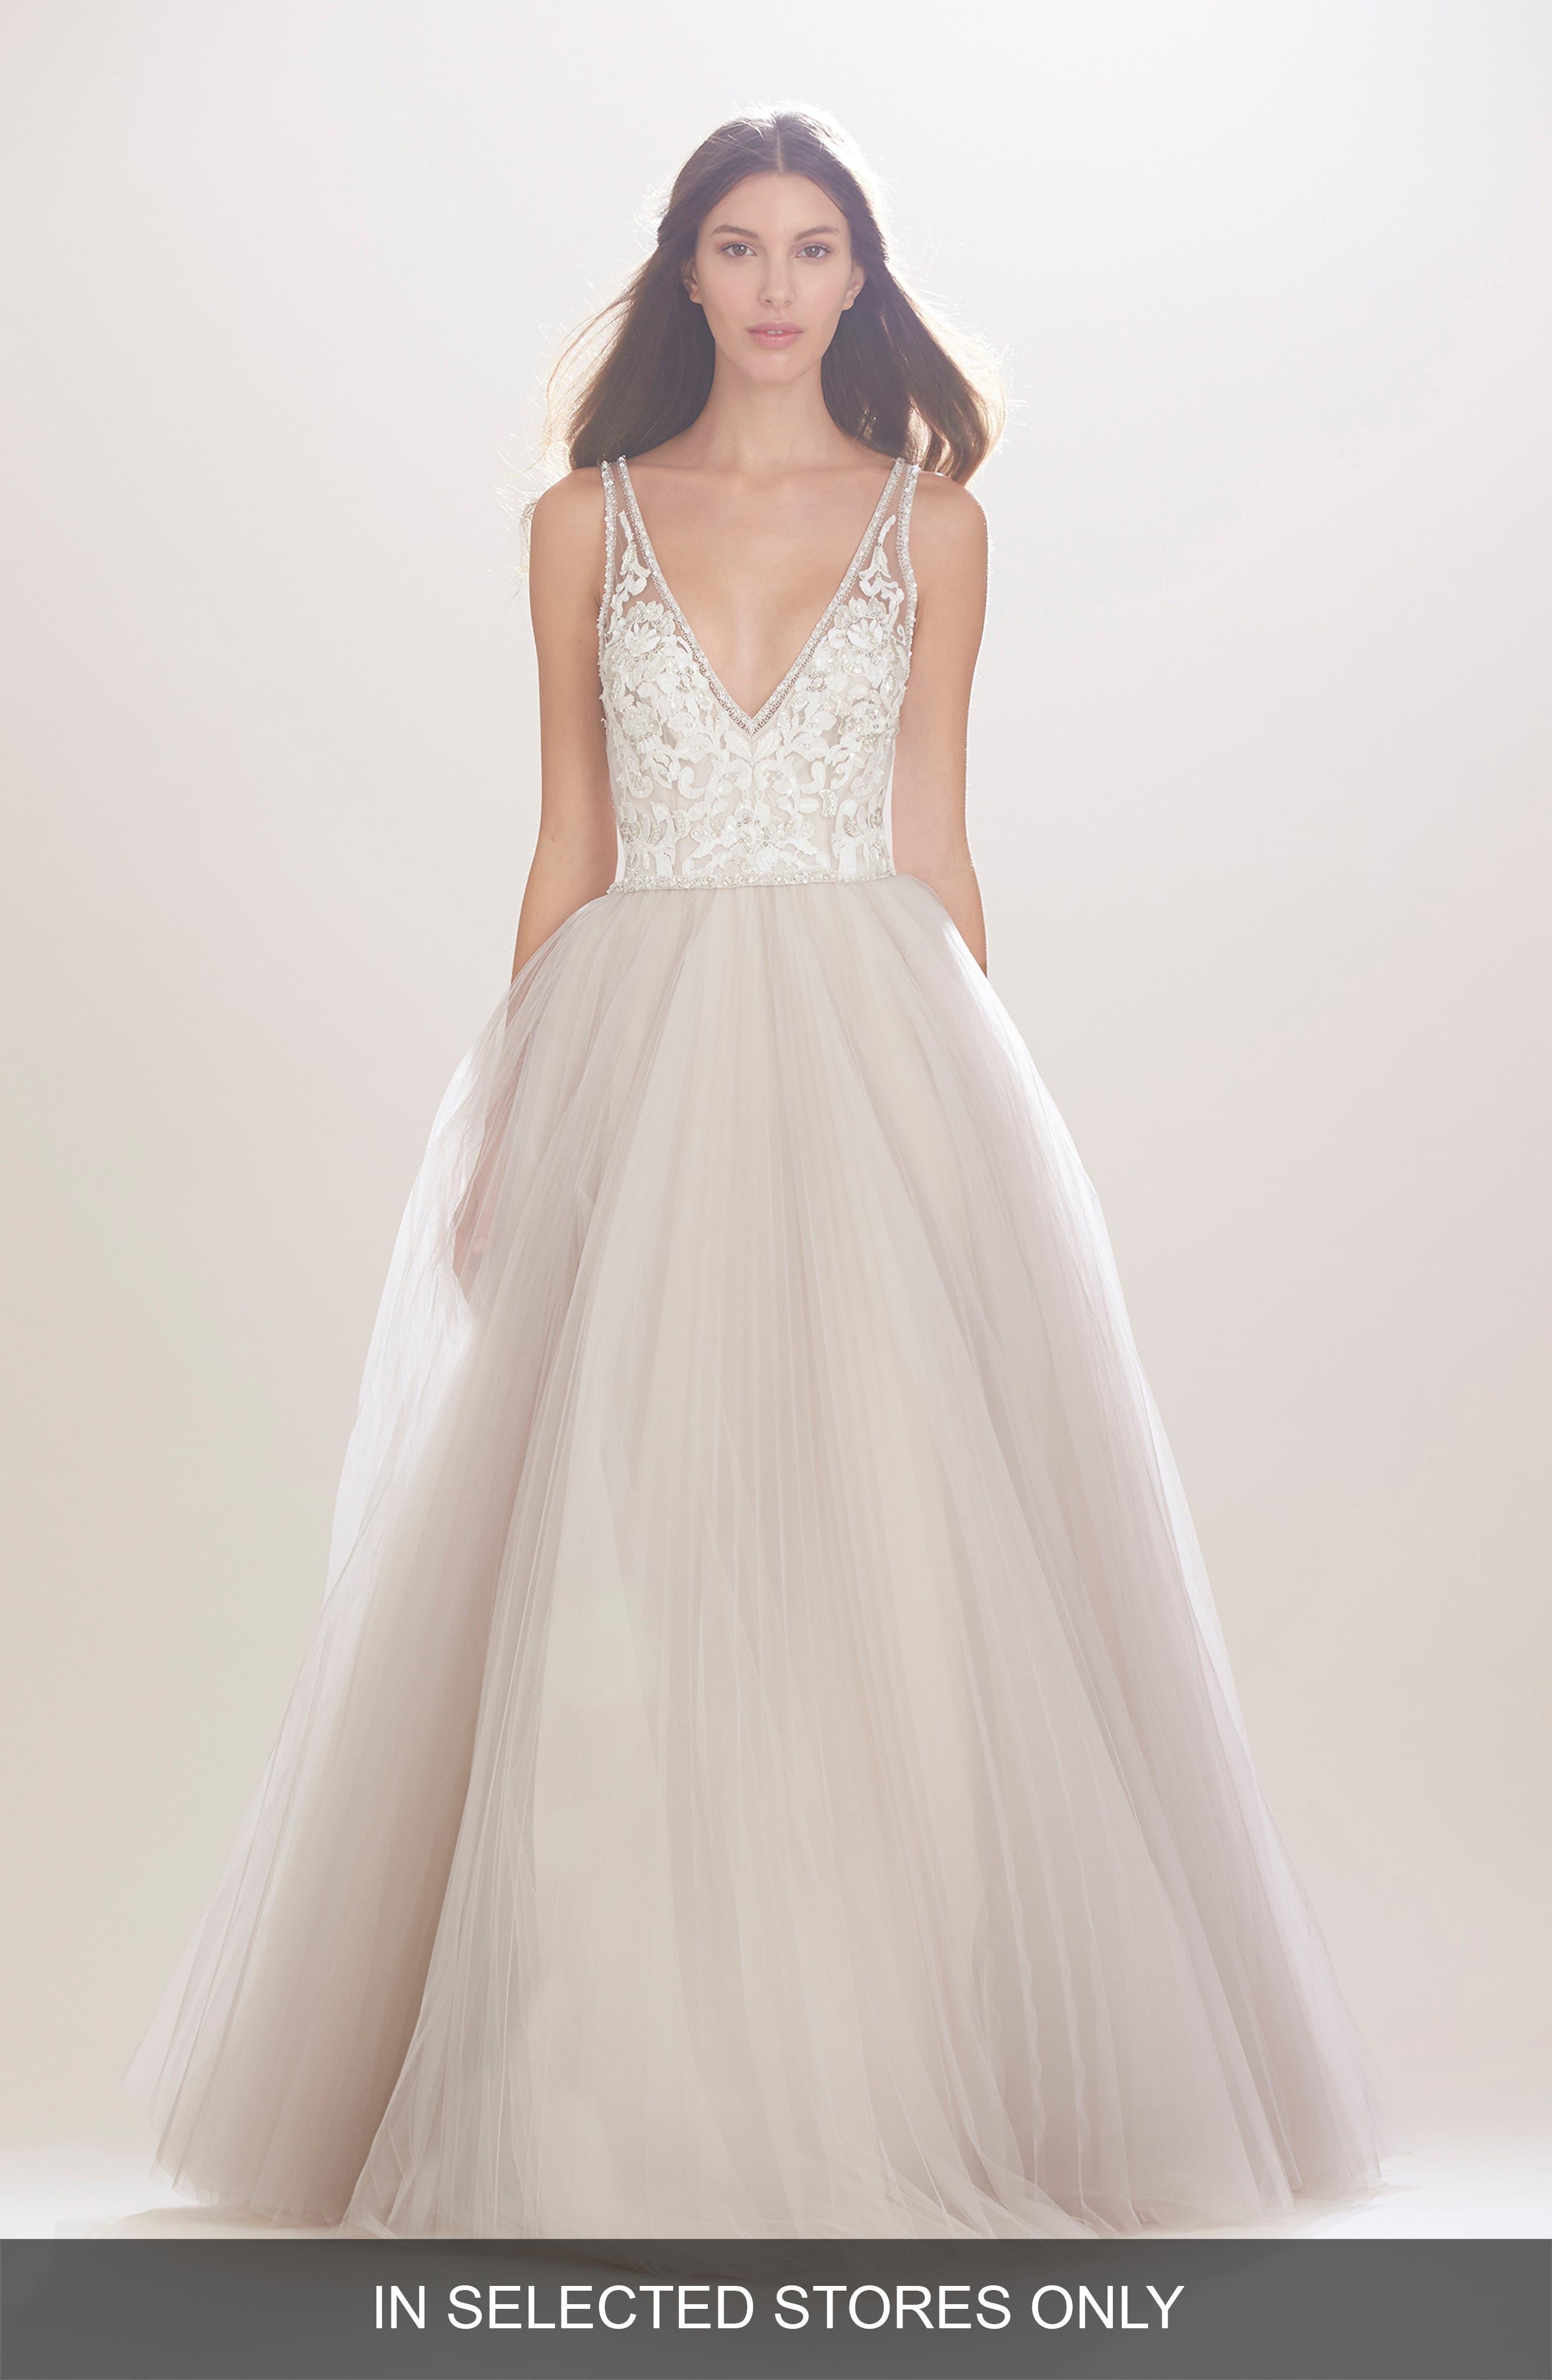 Main Image - Carolina Herrera Mercedes V-Neck Lace & Tulle Gown